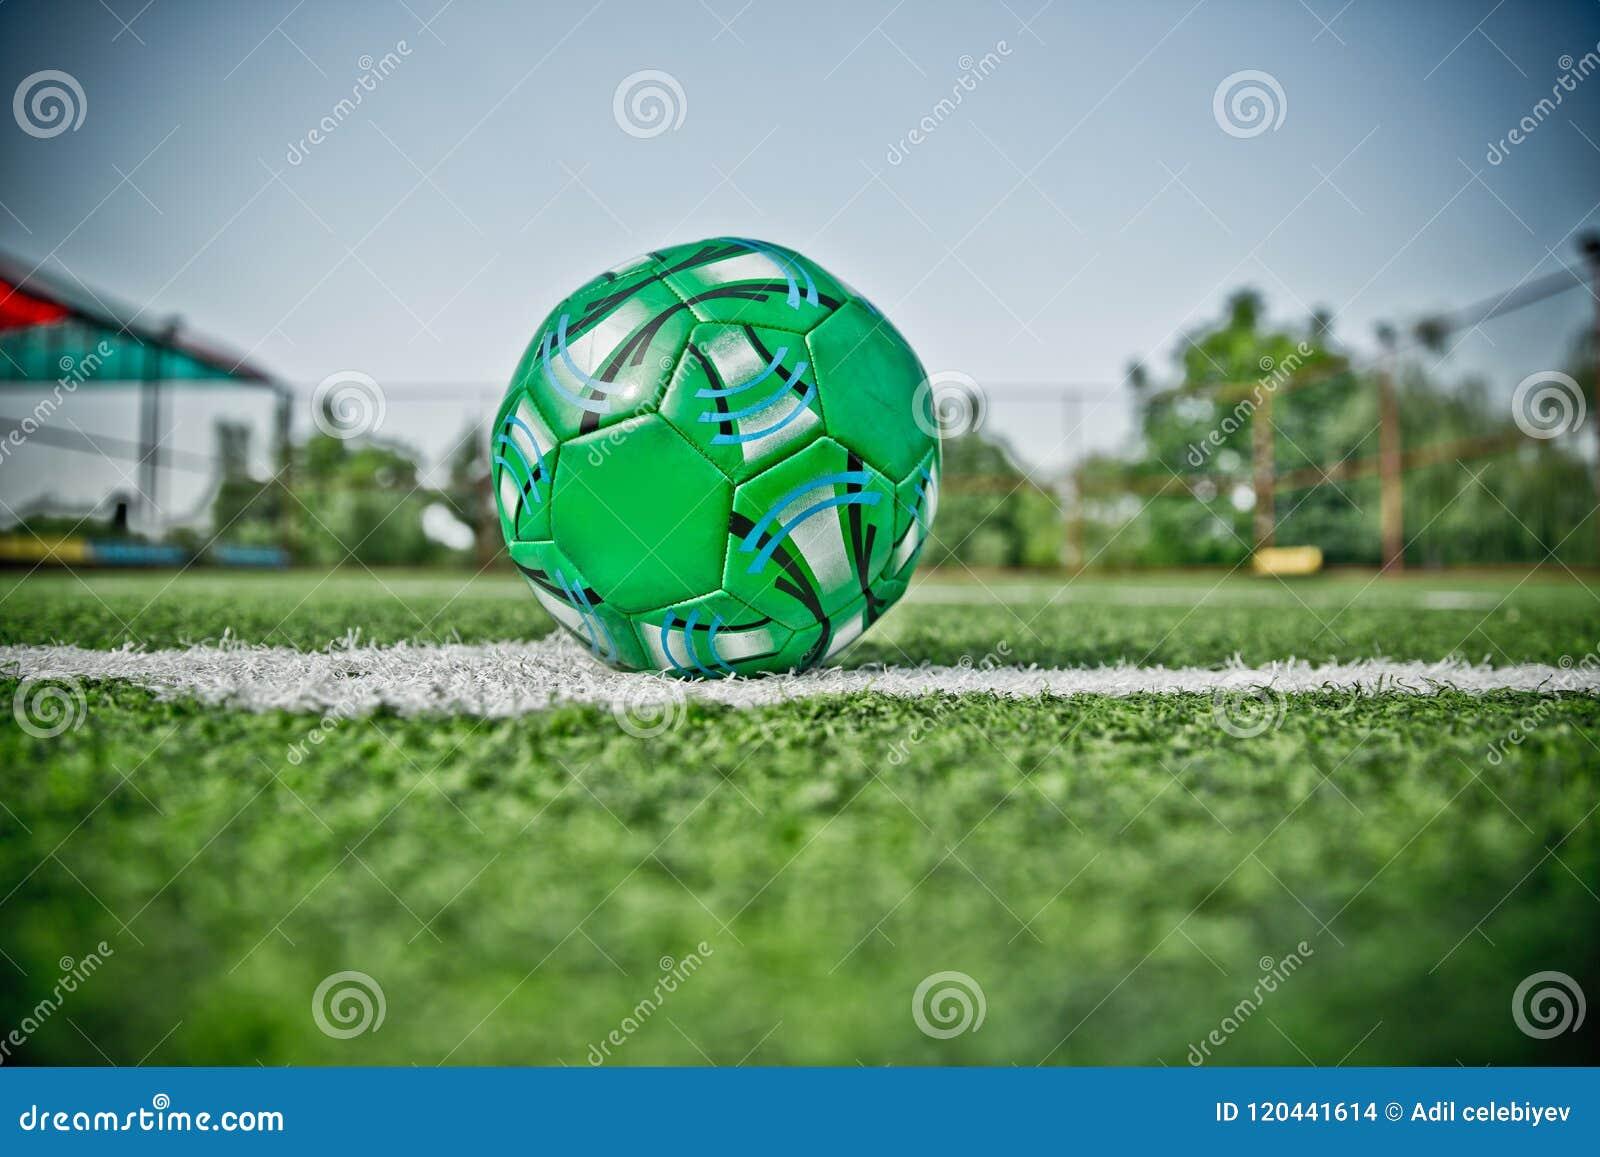 Het Kunstmatige Gras van Mini Football Goal On An Binnen van binnenvoetbalgebied Minivoetbalbal hdr foto